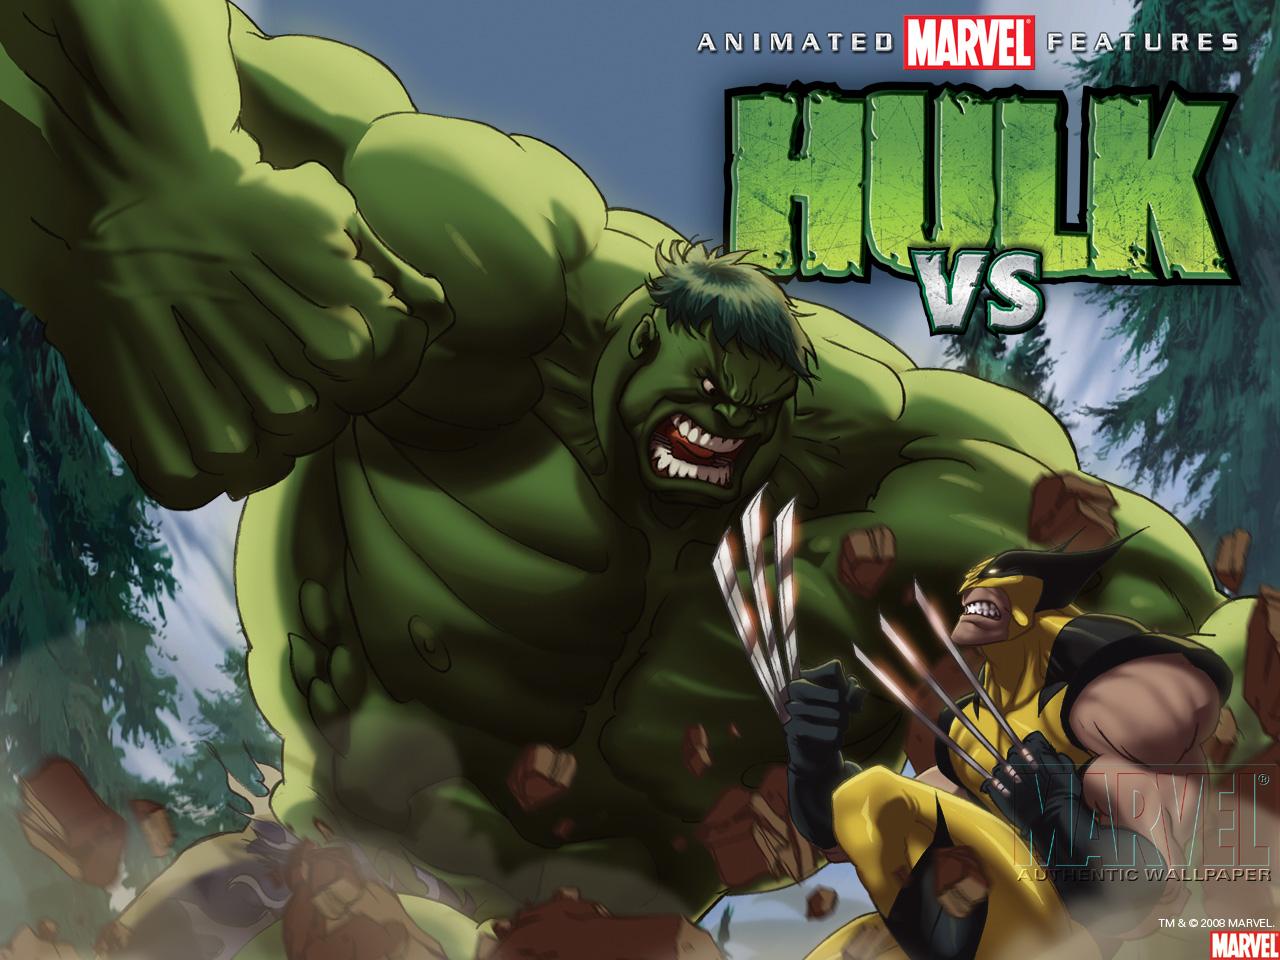 Great Wallpaper Marvel The Incredible Hulk - 4bc5ae60a4d8c  Photograph_59670.jpg